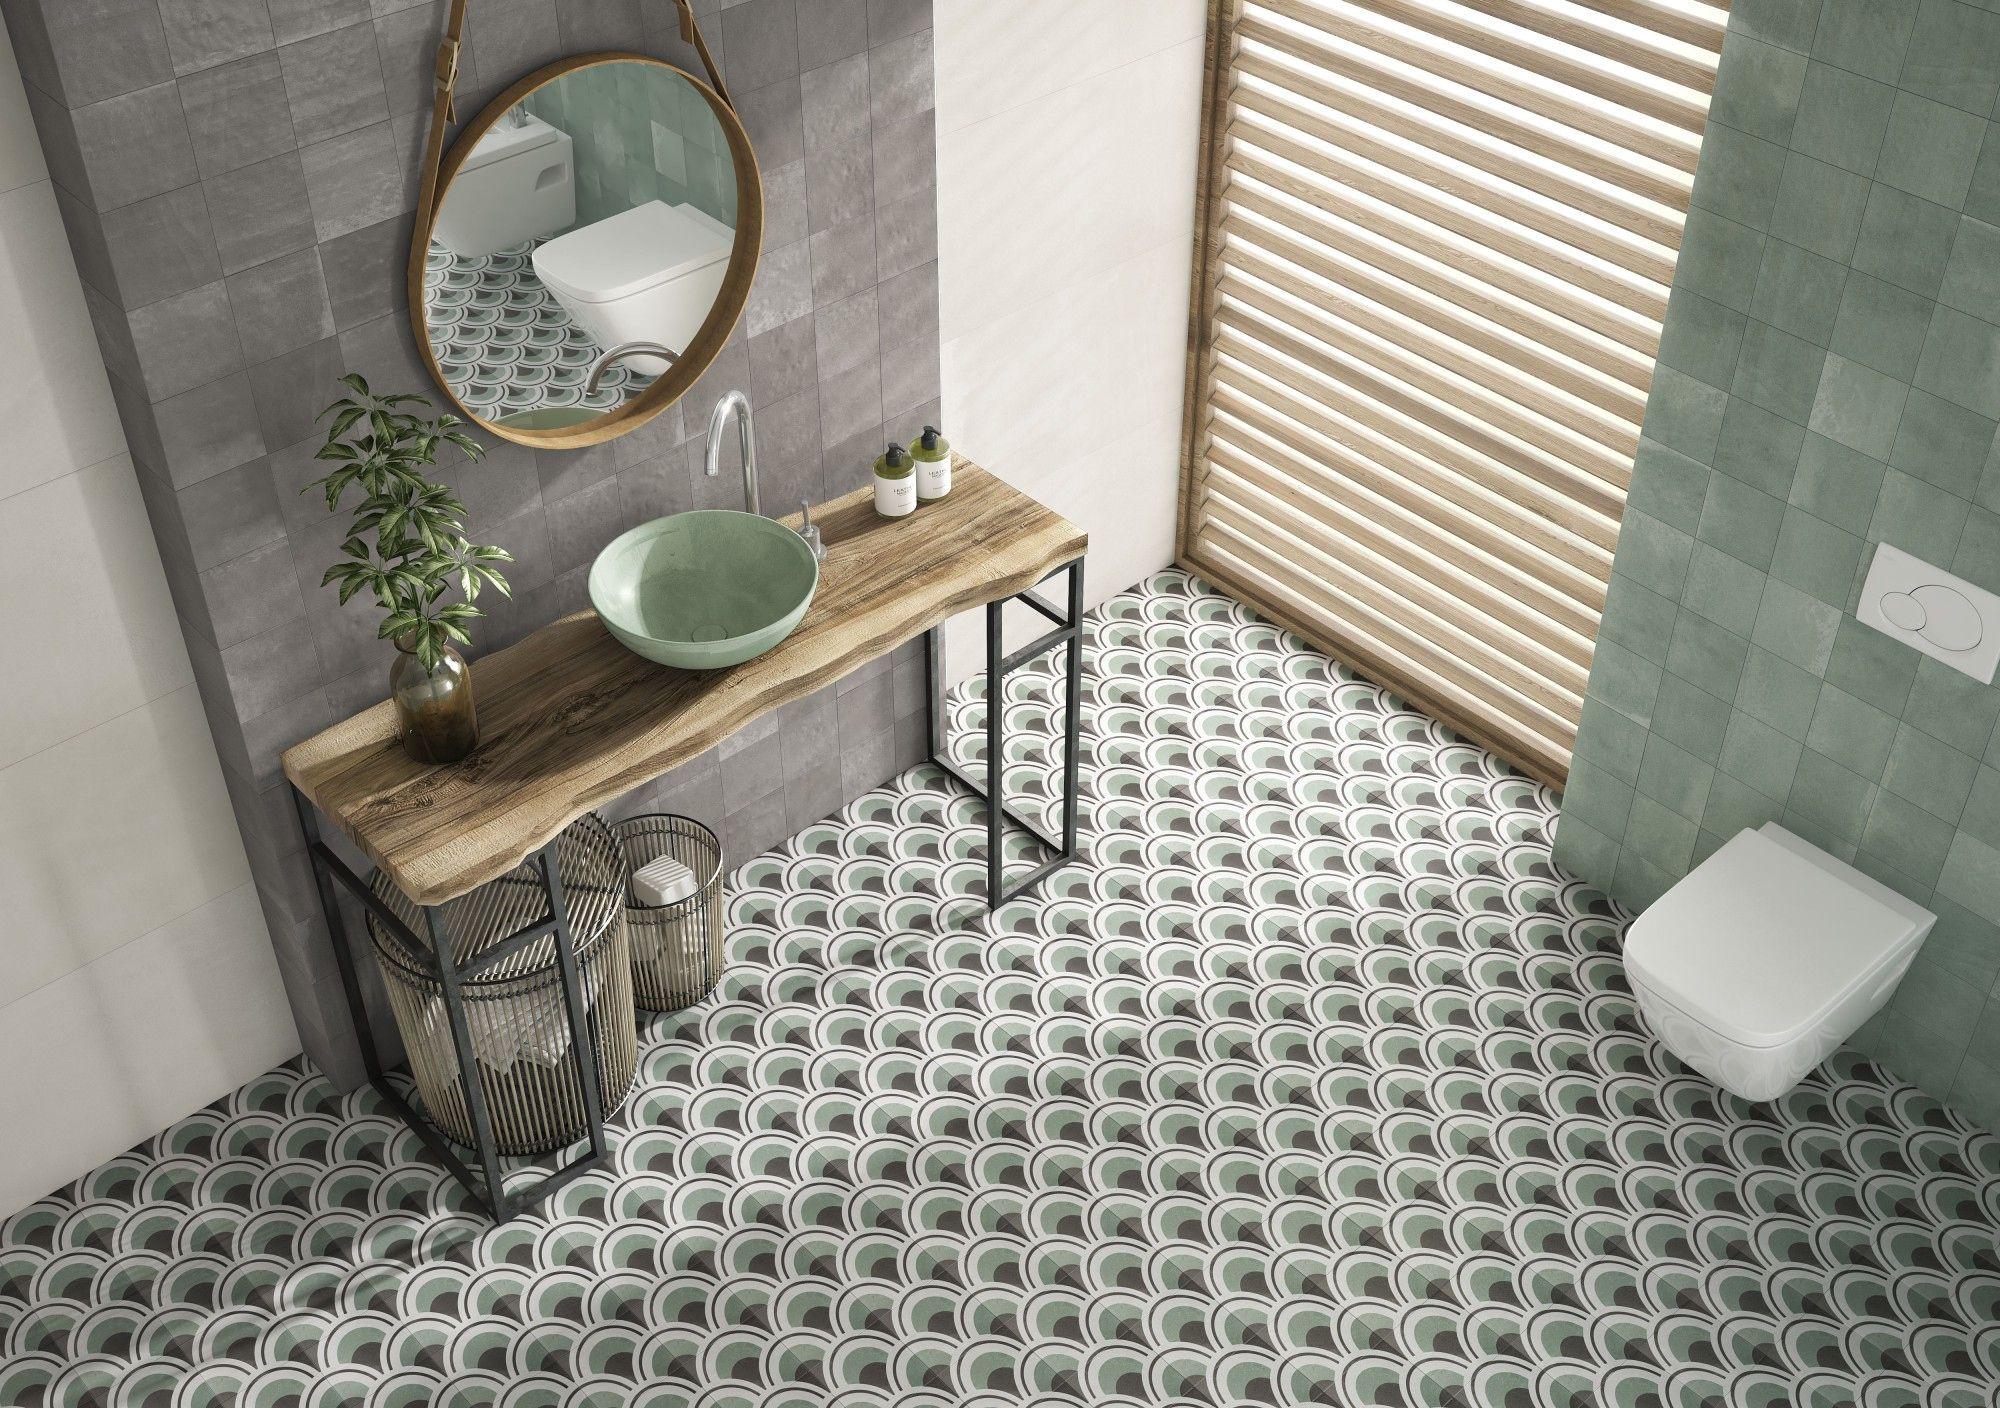 Art Deco Tile Green Bathroom Style In 2020 Green Tile Floor Flooring Bathroom Style